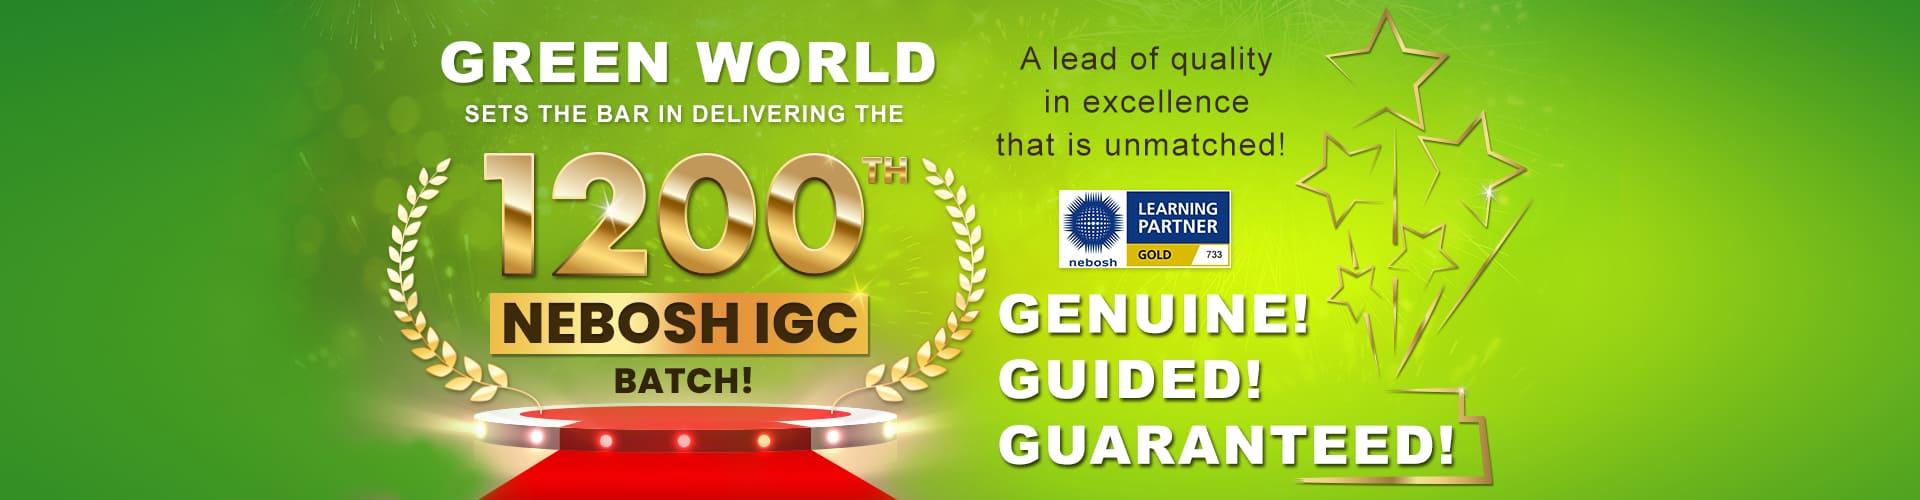 Green-World-1200th-NEBOSH-IGC-batch_Banner_Sep_2021_coin_Slider_Banner